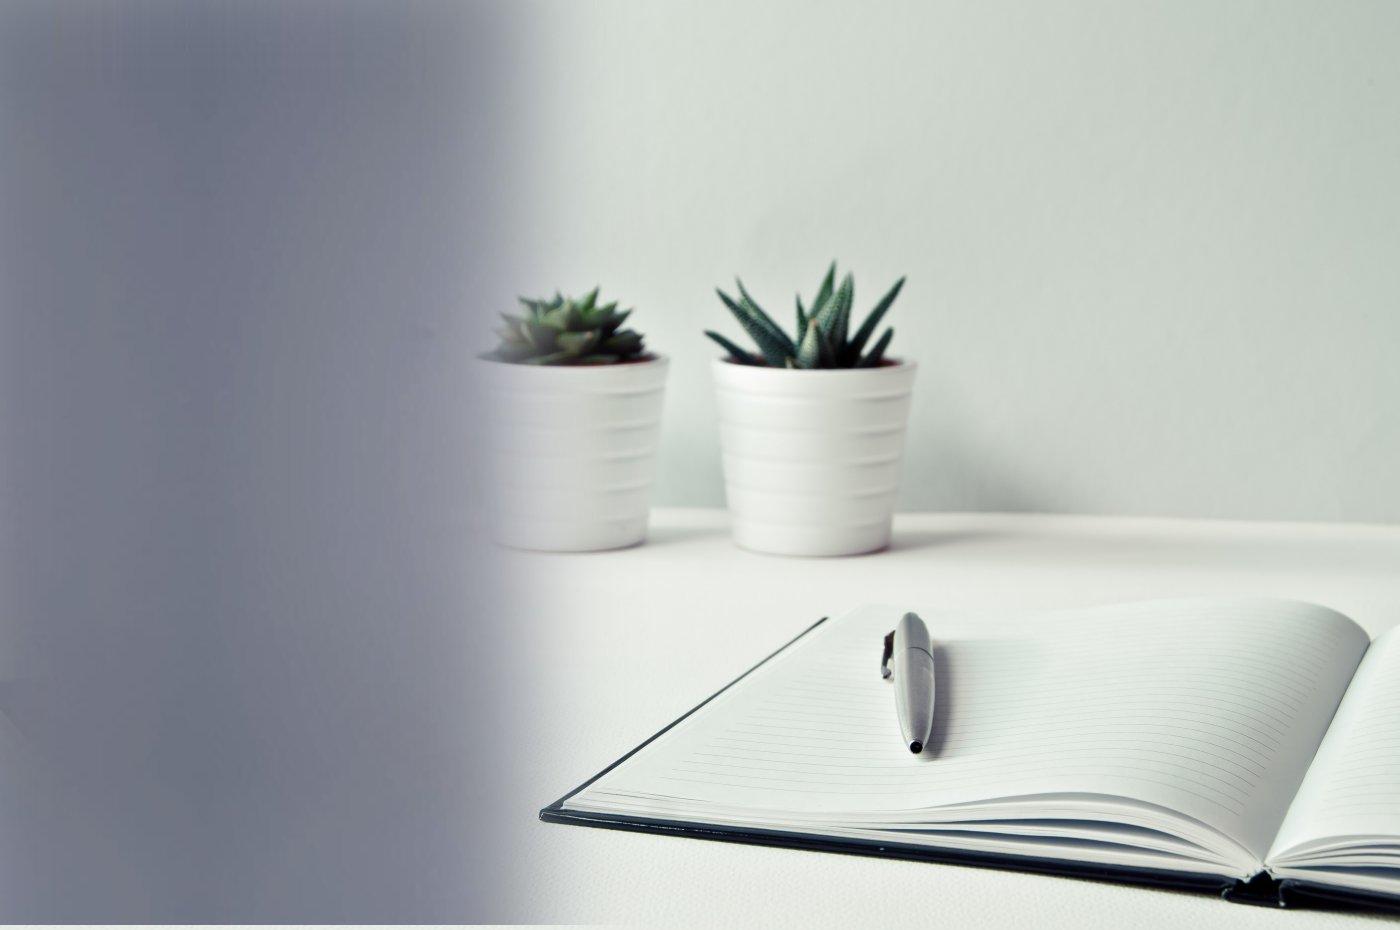 BOOKKEEPINGinnovate & grow